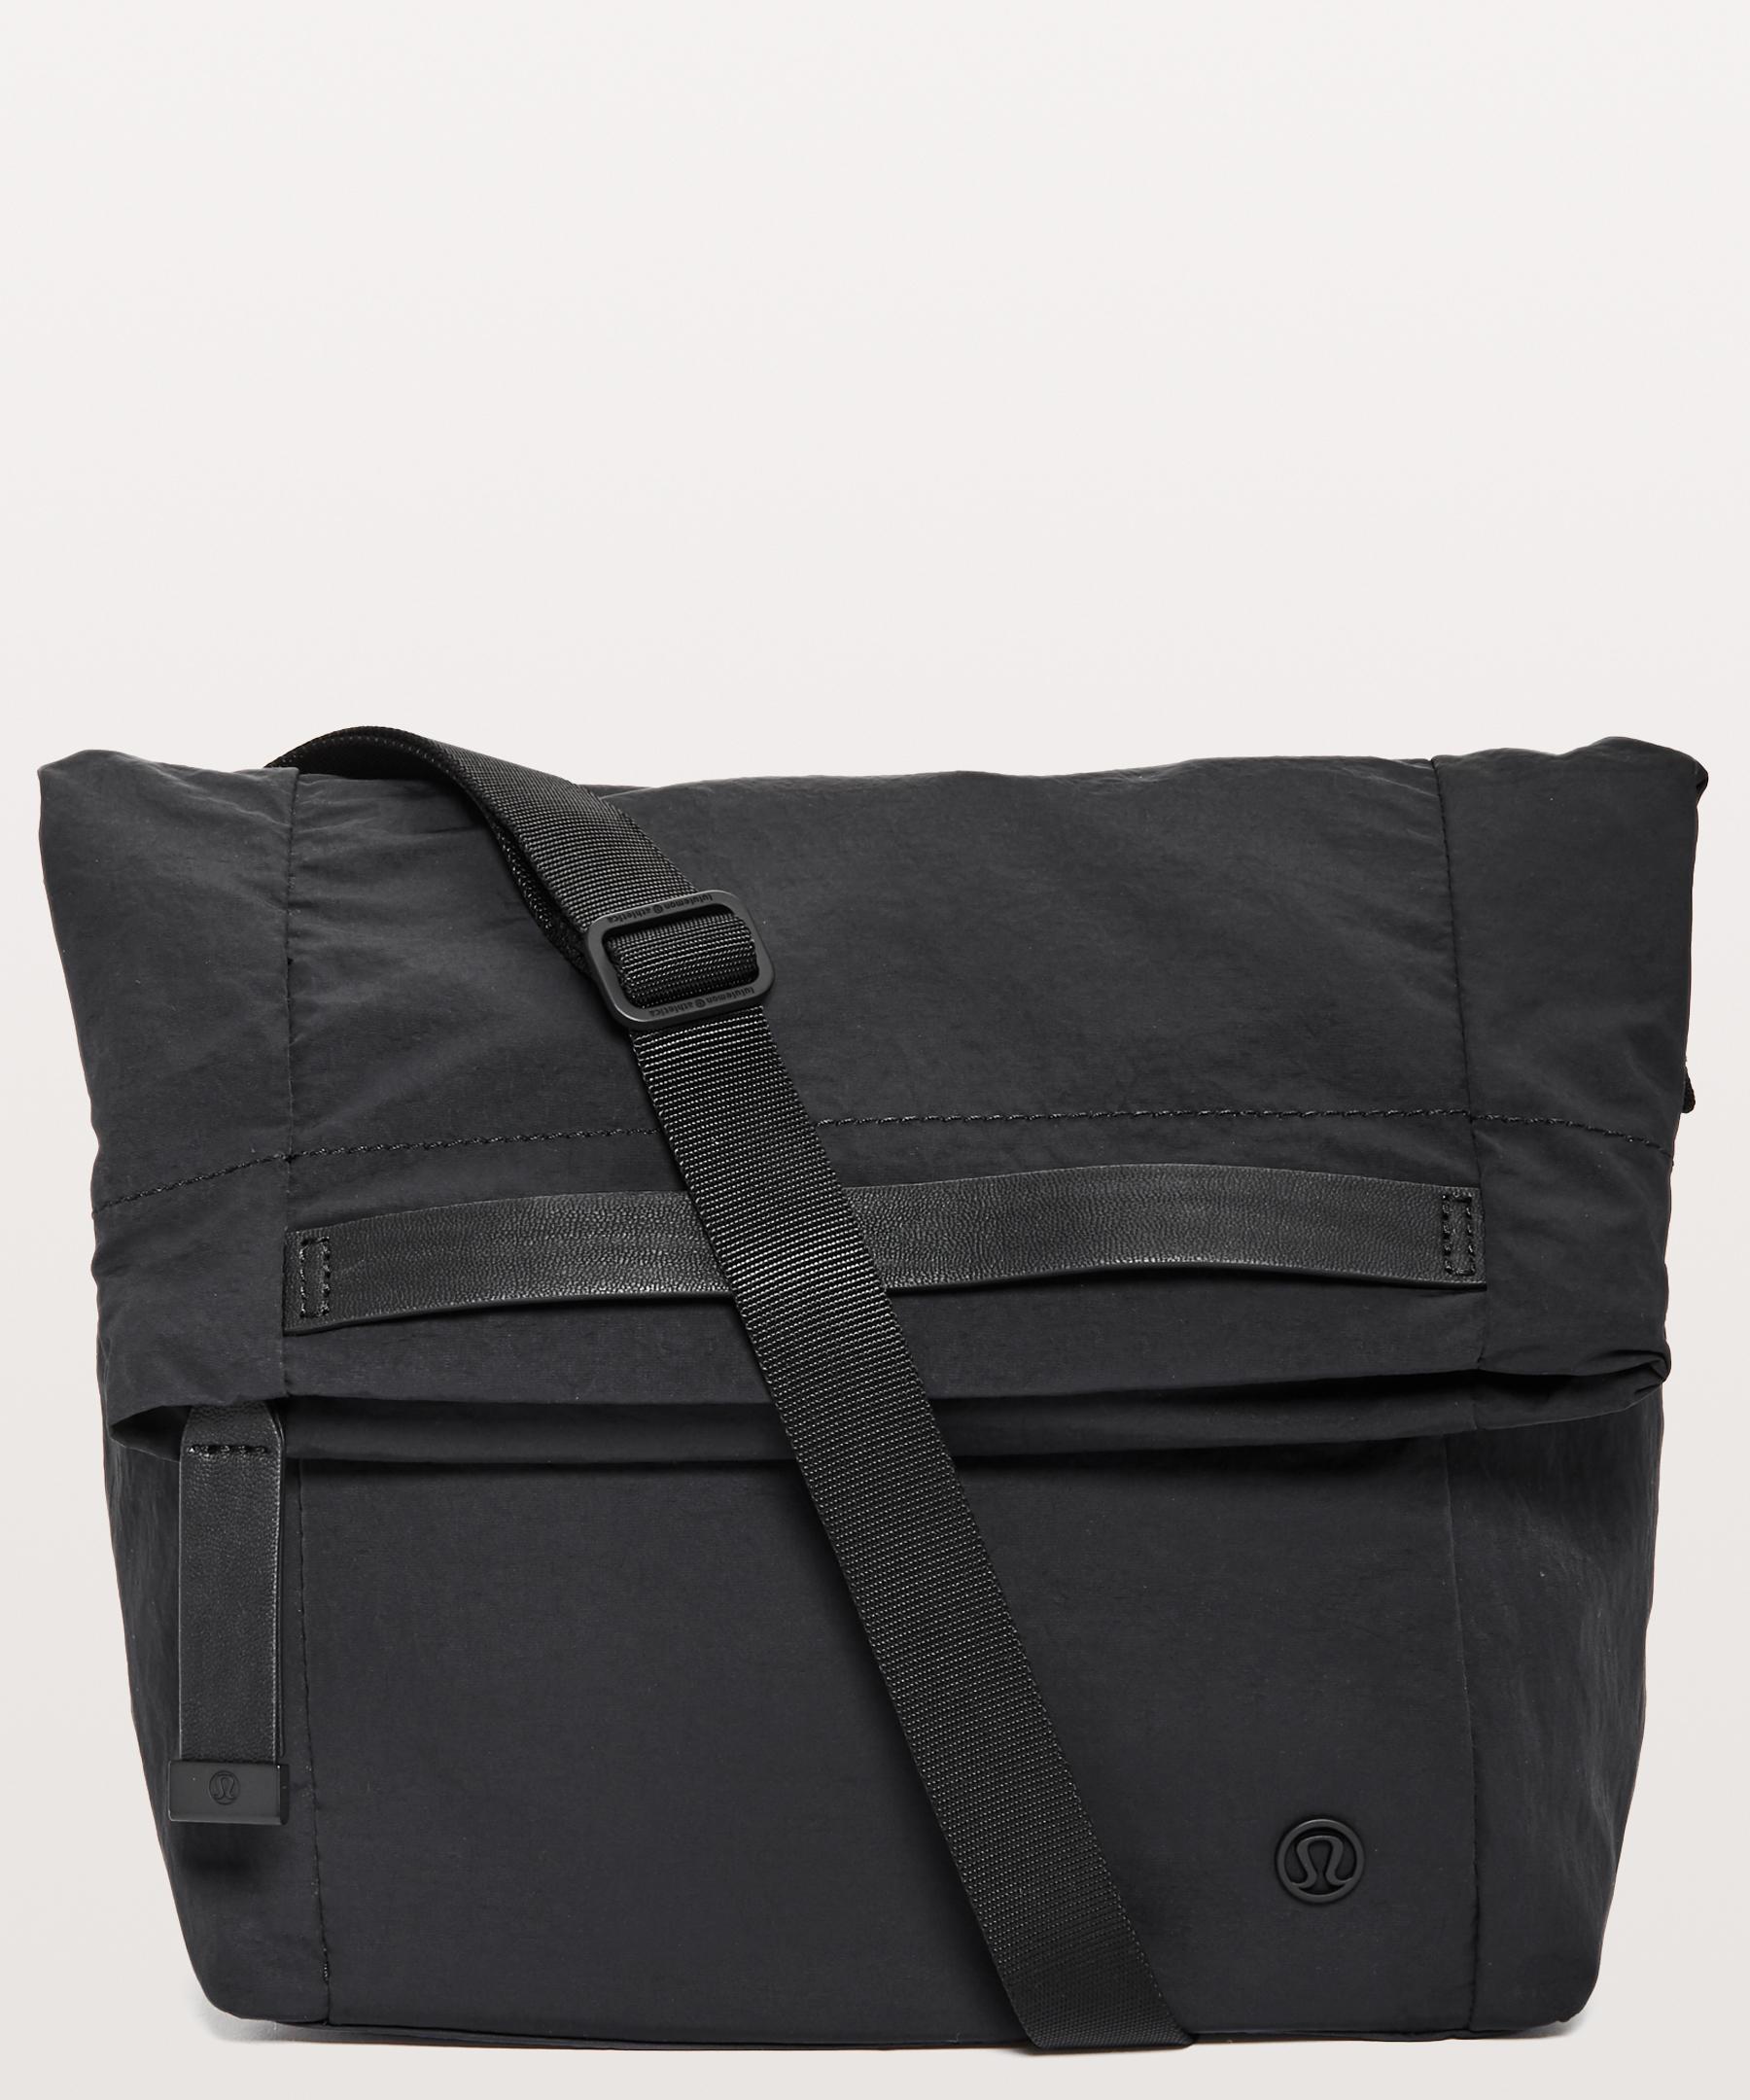 ef0e814f6fba Lyst - lululemon athletica On My Level Cross Body Bag in Black